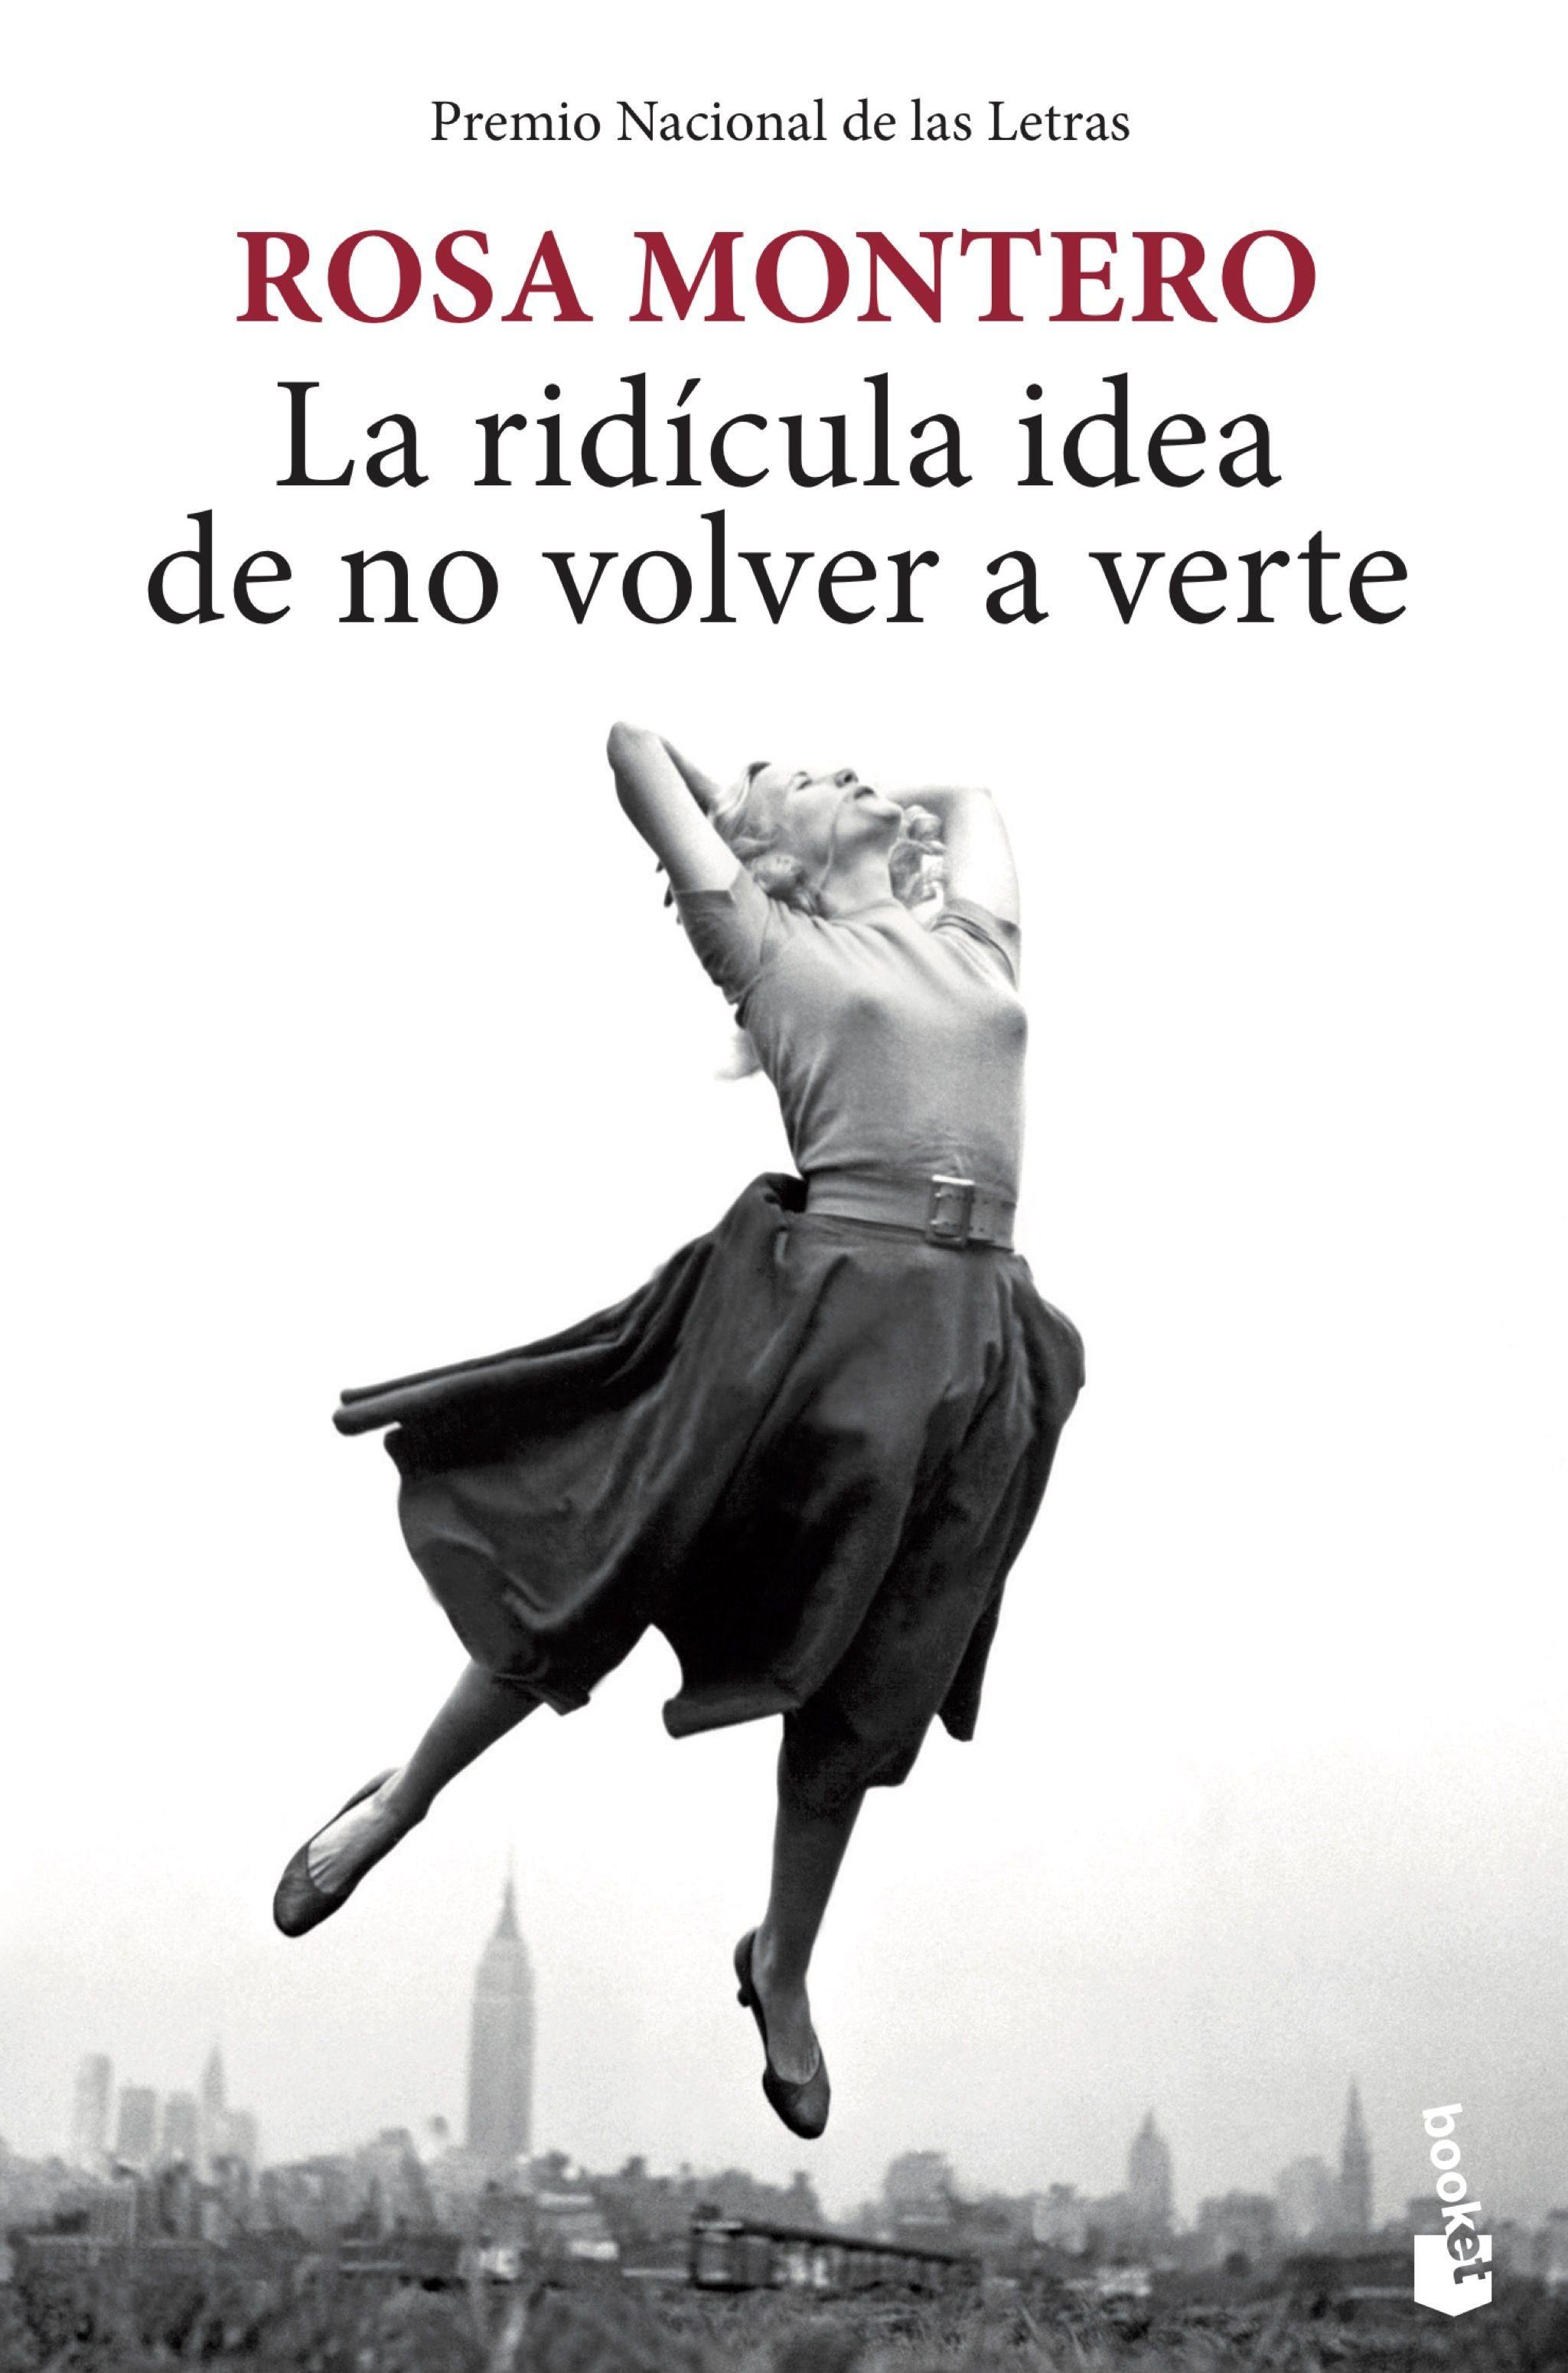 La Ridicula Idea de no Volver a Verte - Rosa Montero - Booket